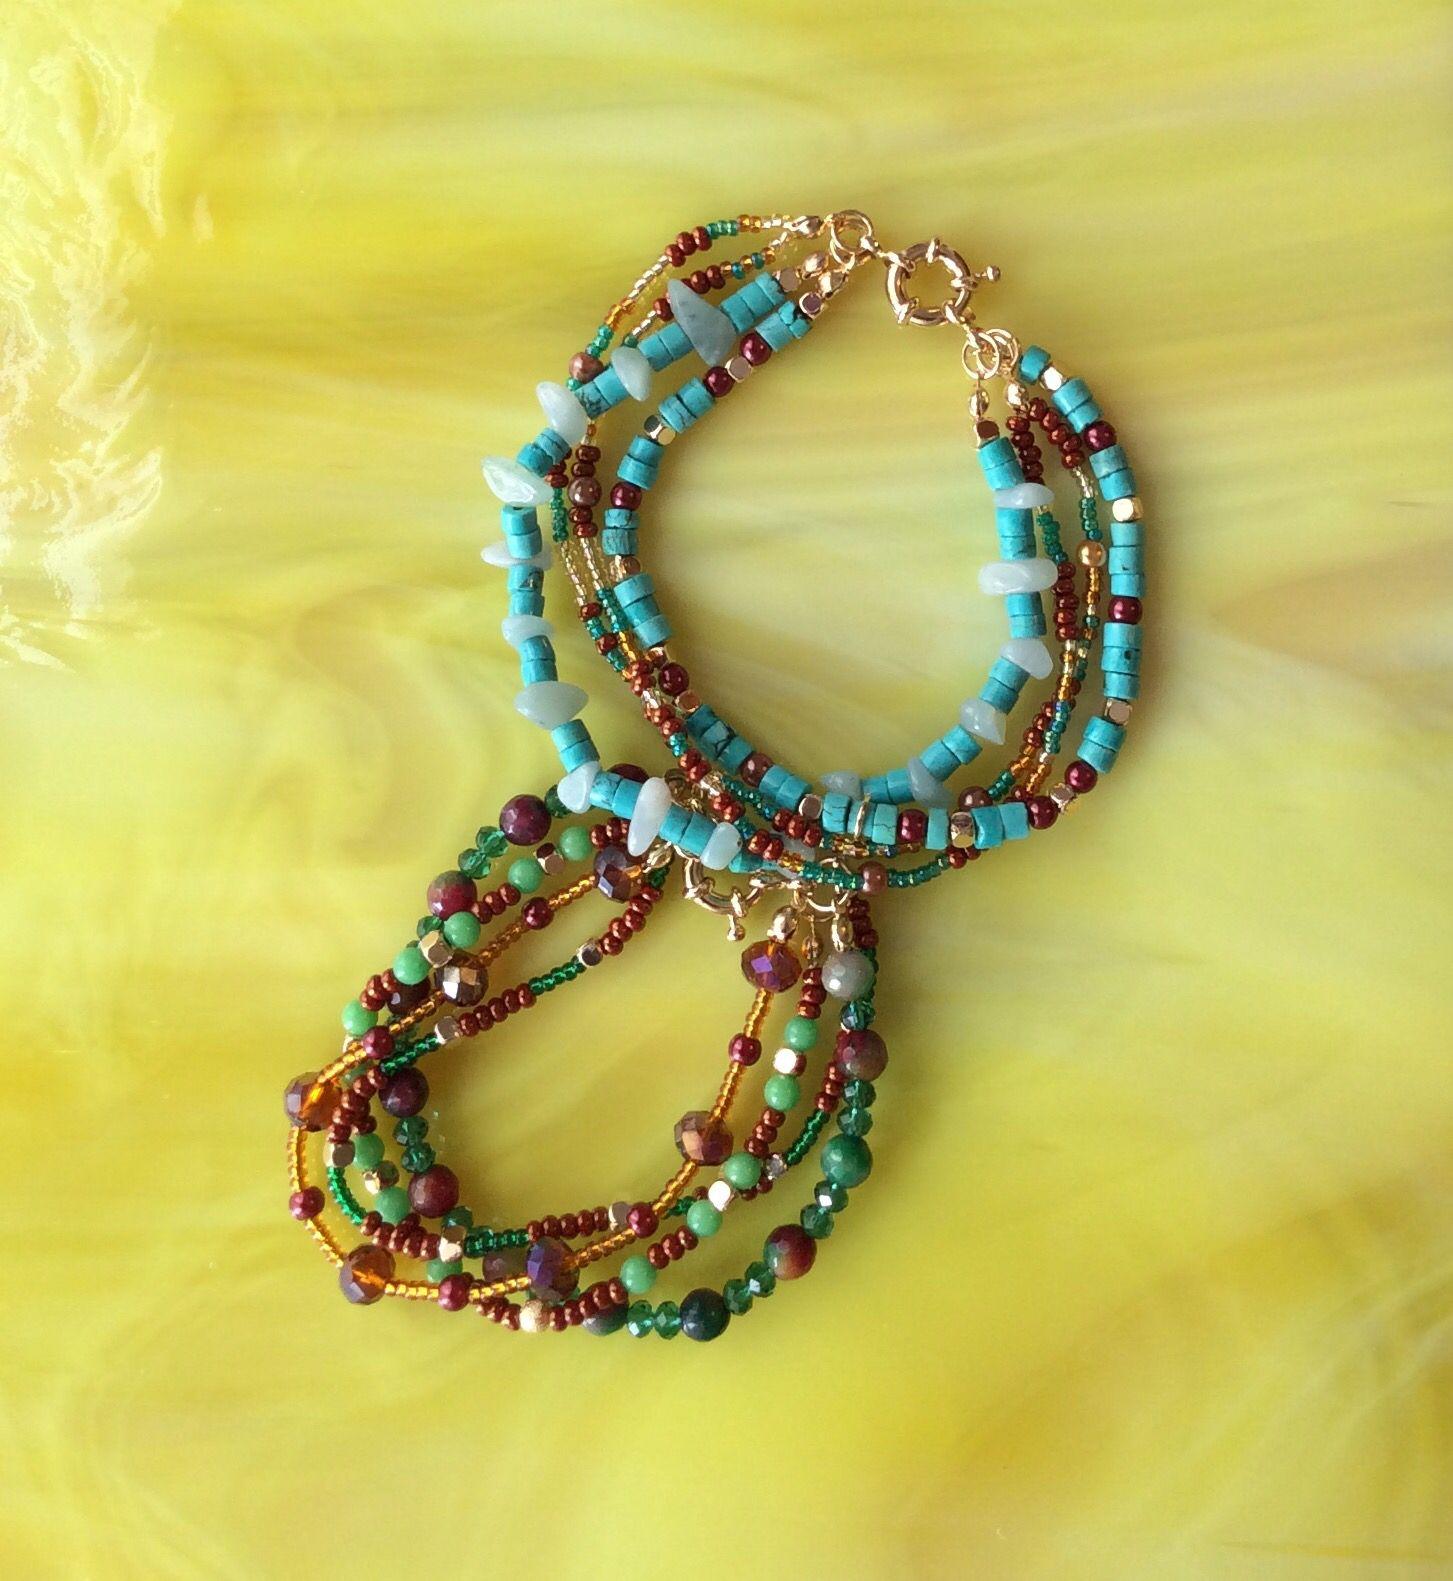 Colorful, magic bracelets!